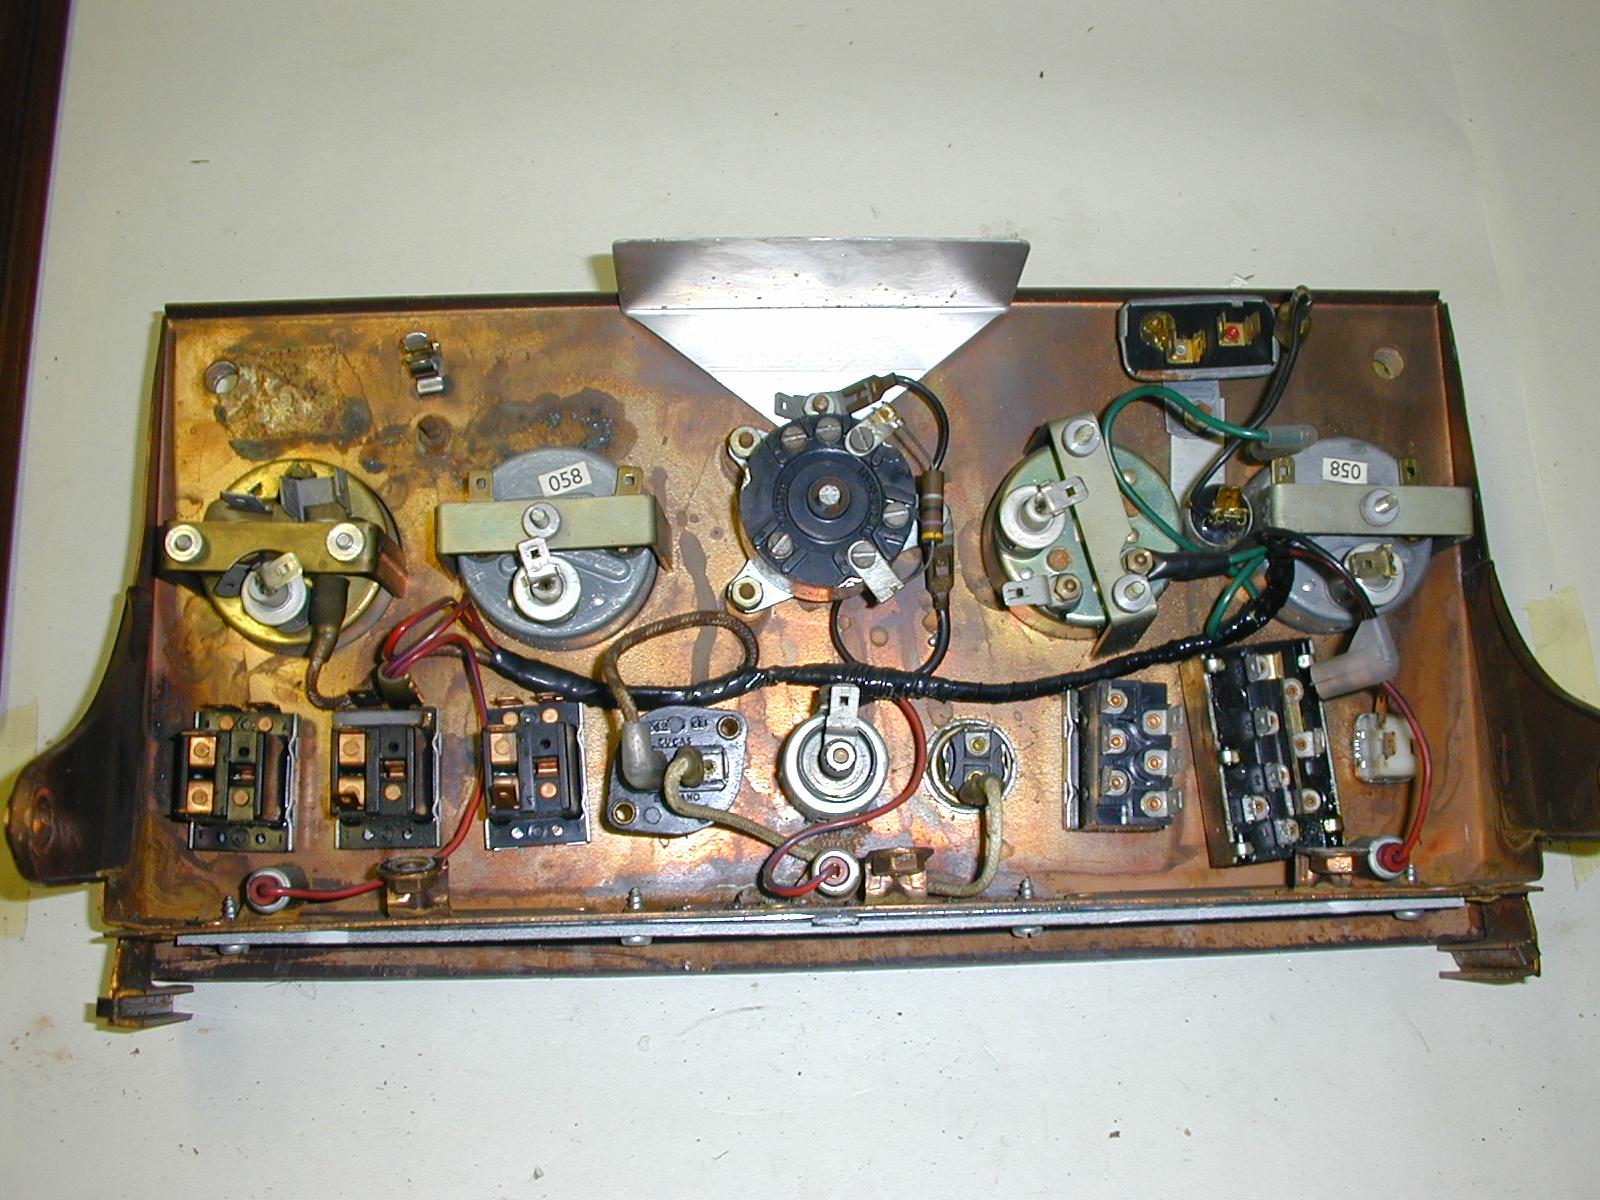 Xke S2 Voltage Regulator E Type Jag Lovers Forums 1968 Jaguar Wiring Diagram Wood Refinish20030720 0351600x1200 682 Kb